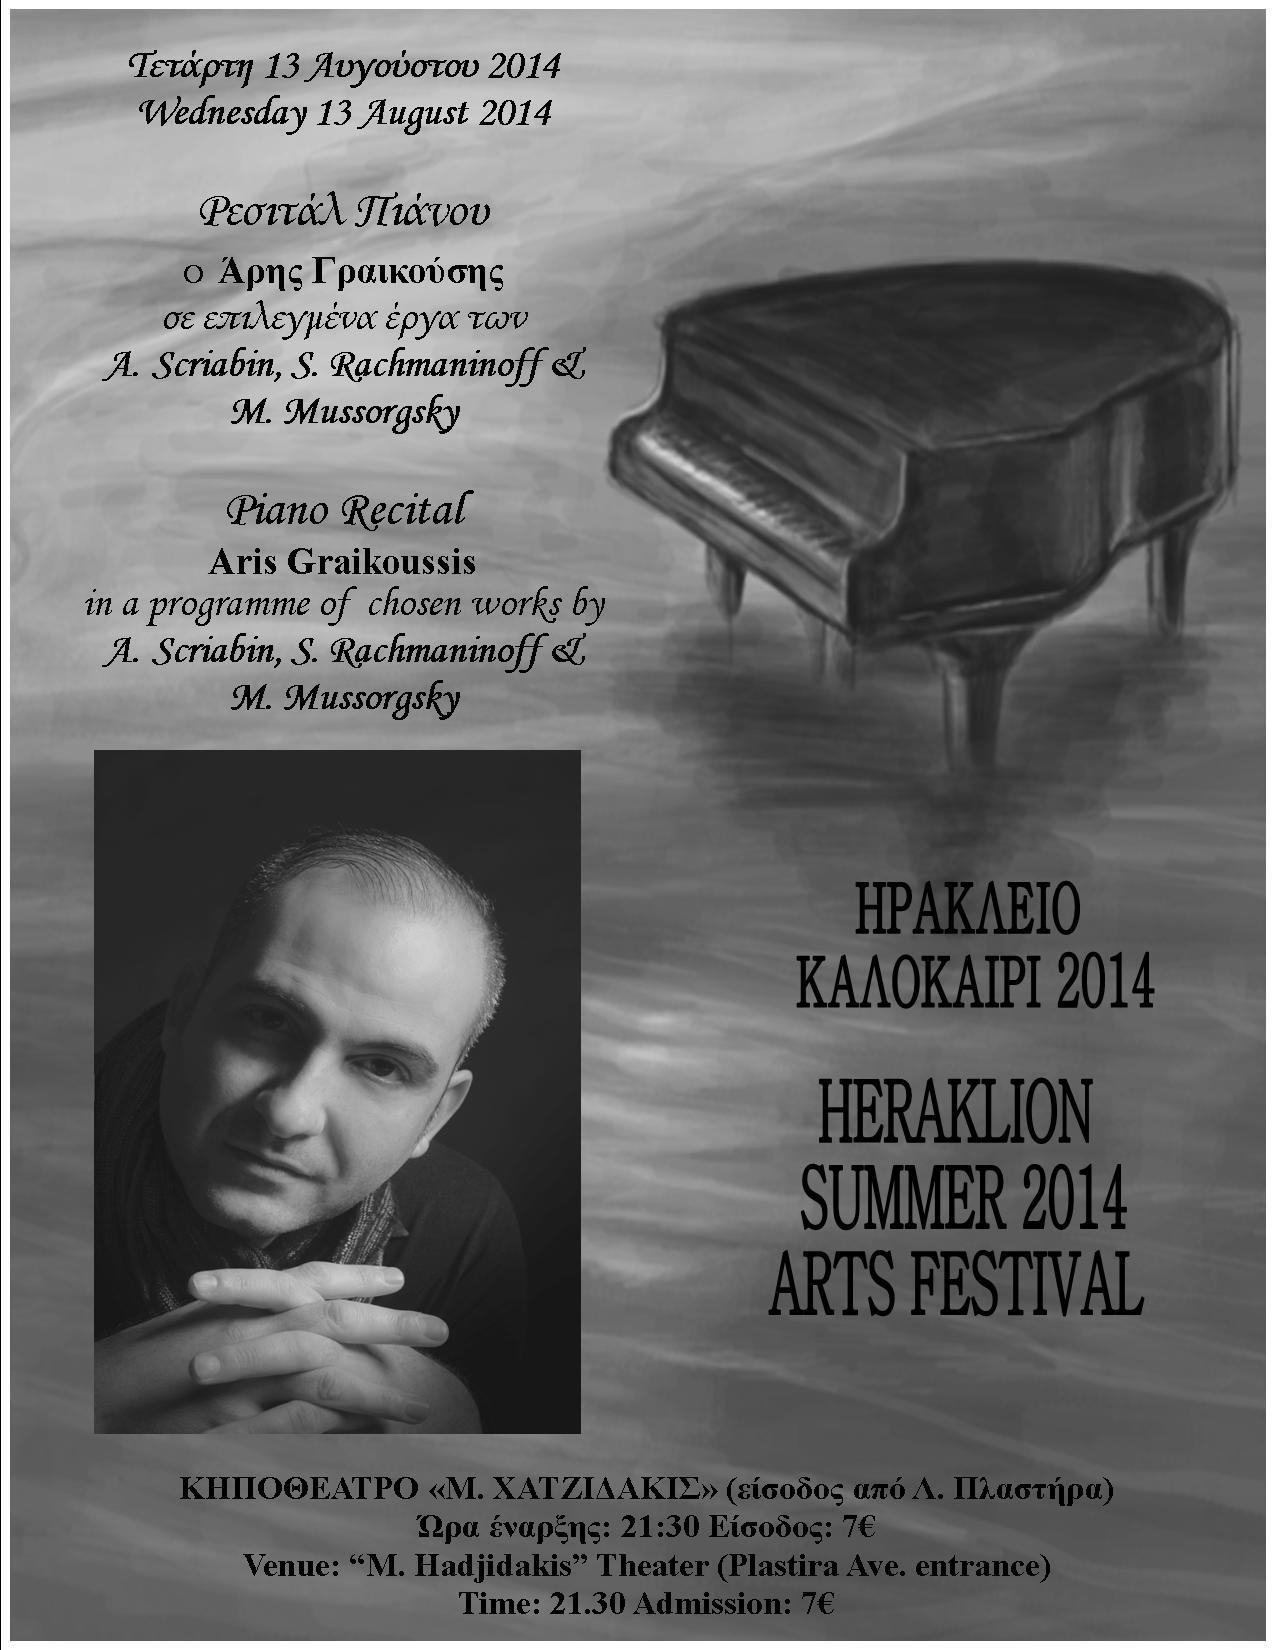 Promenade. Ρεσιτάλ Πιάνου του Άρη Γραικούση στο πλαίσιο των πολιτιστικών εκδηλώσεων του φεστιβάλ «Ηράκλειο - Καλοκαίρι 2014»